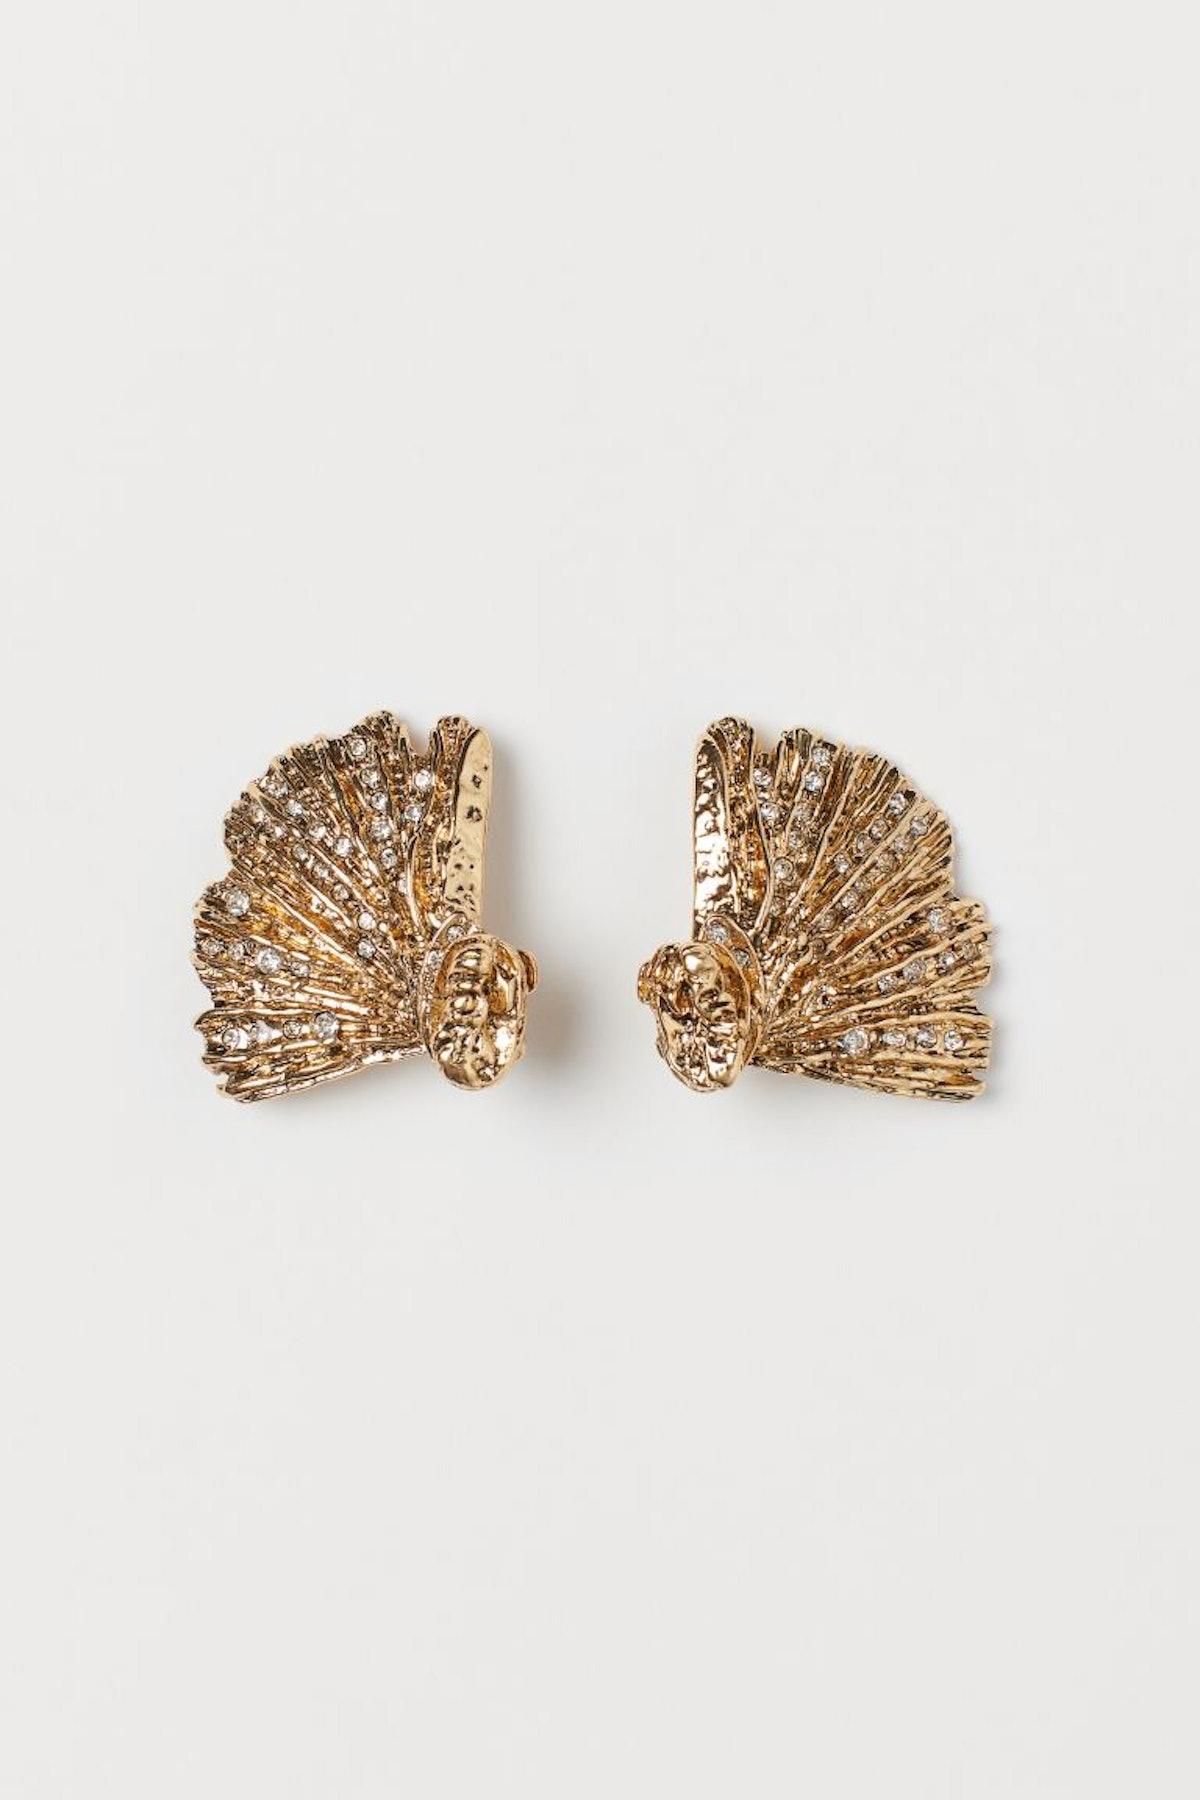 H&M Clip Earrings